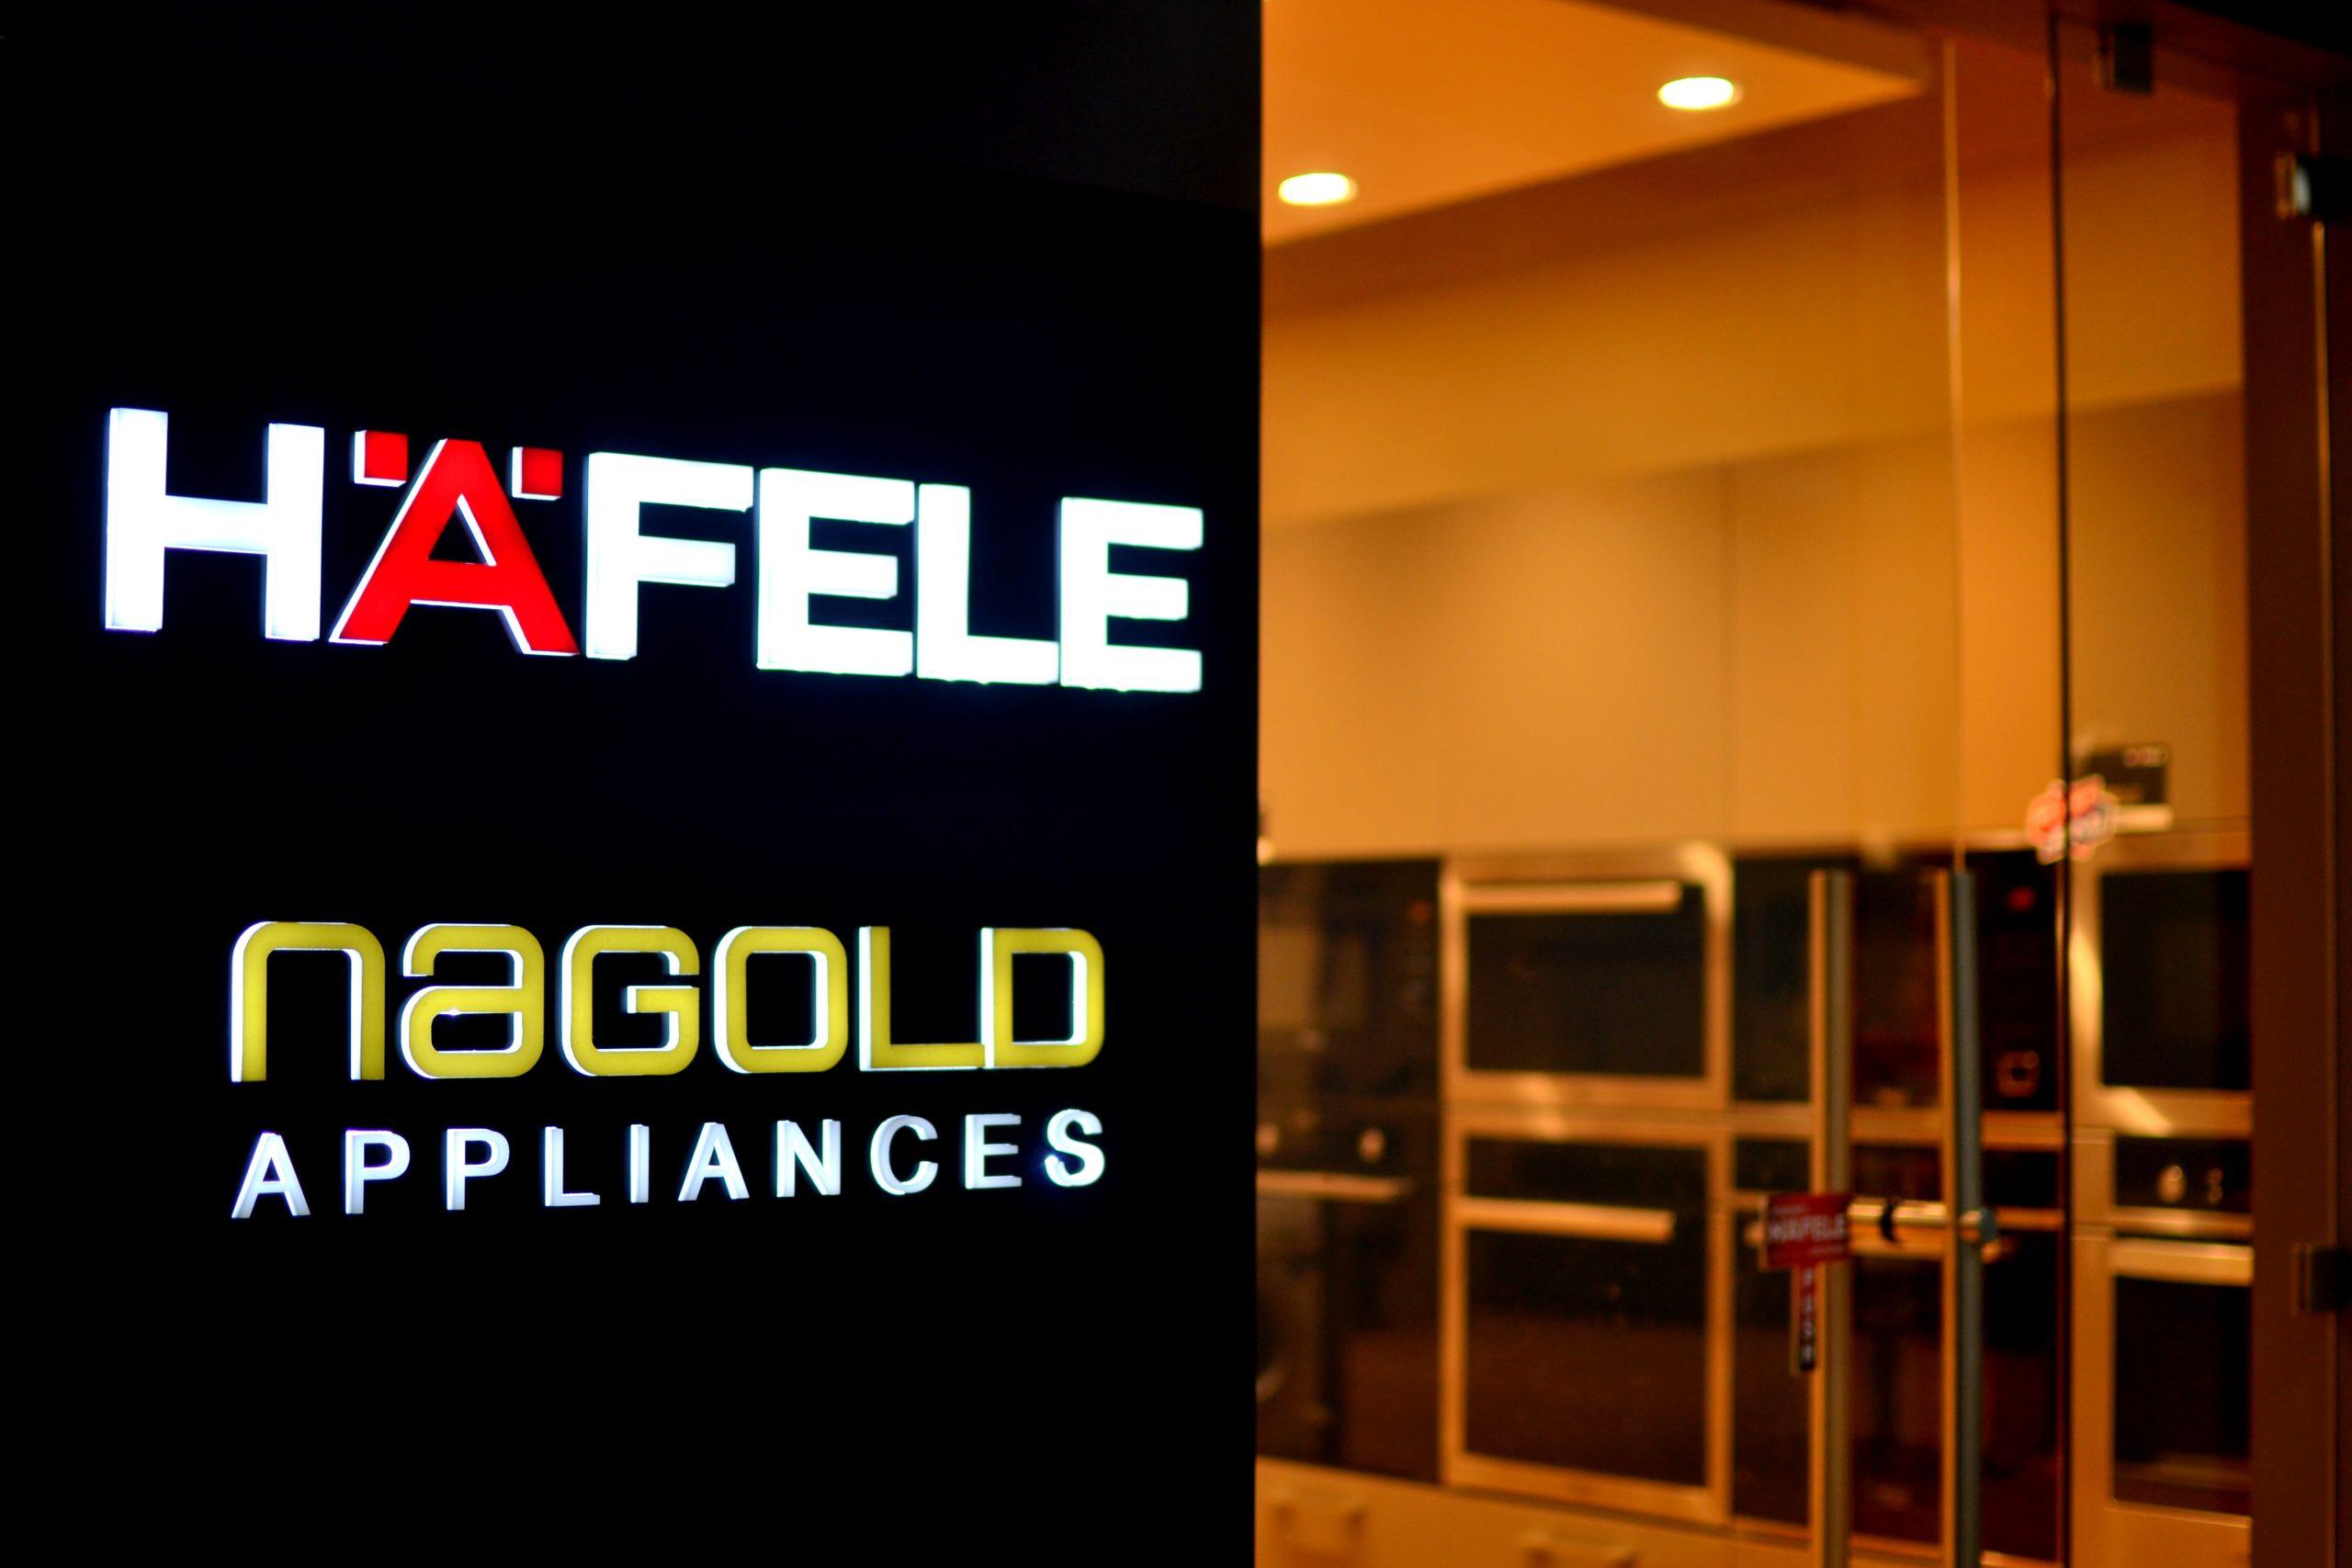 Nagold appliances